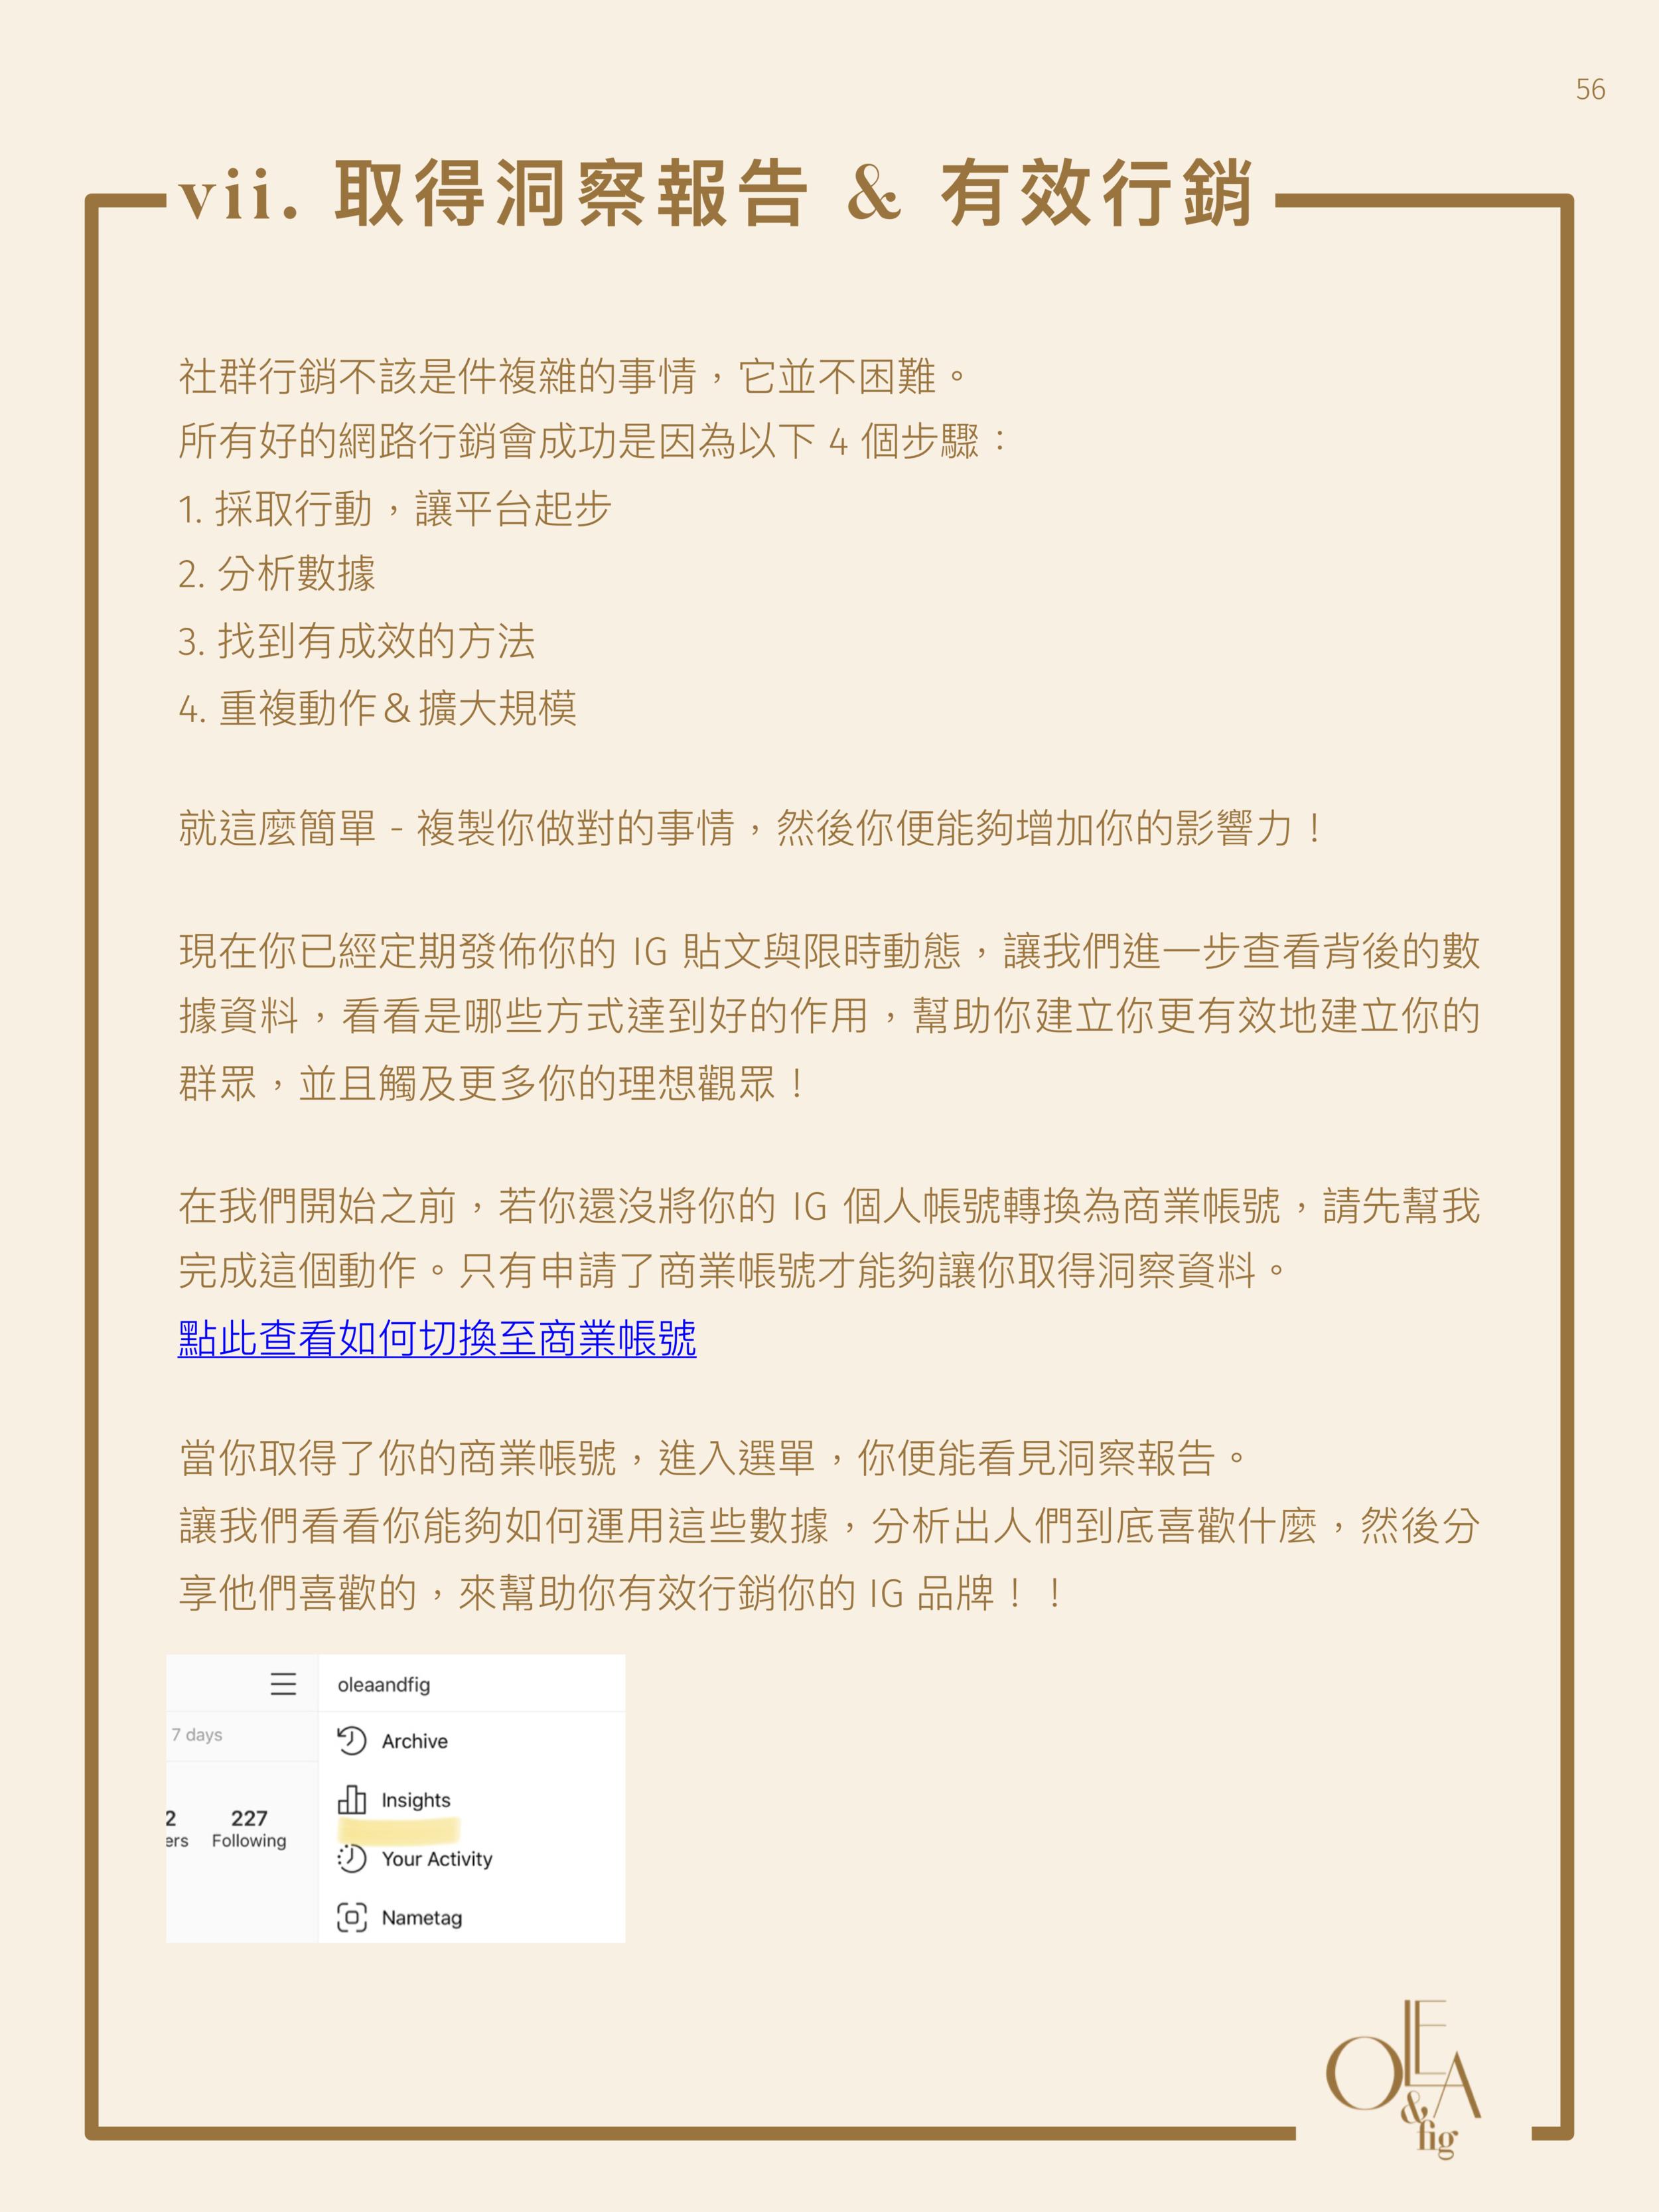 [Olea & FIg] IG終極指南手冊 copy 6.png